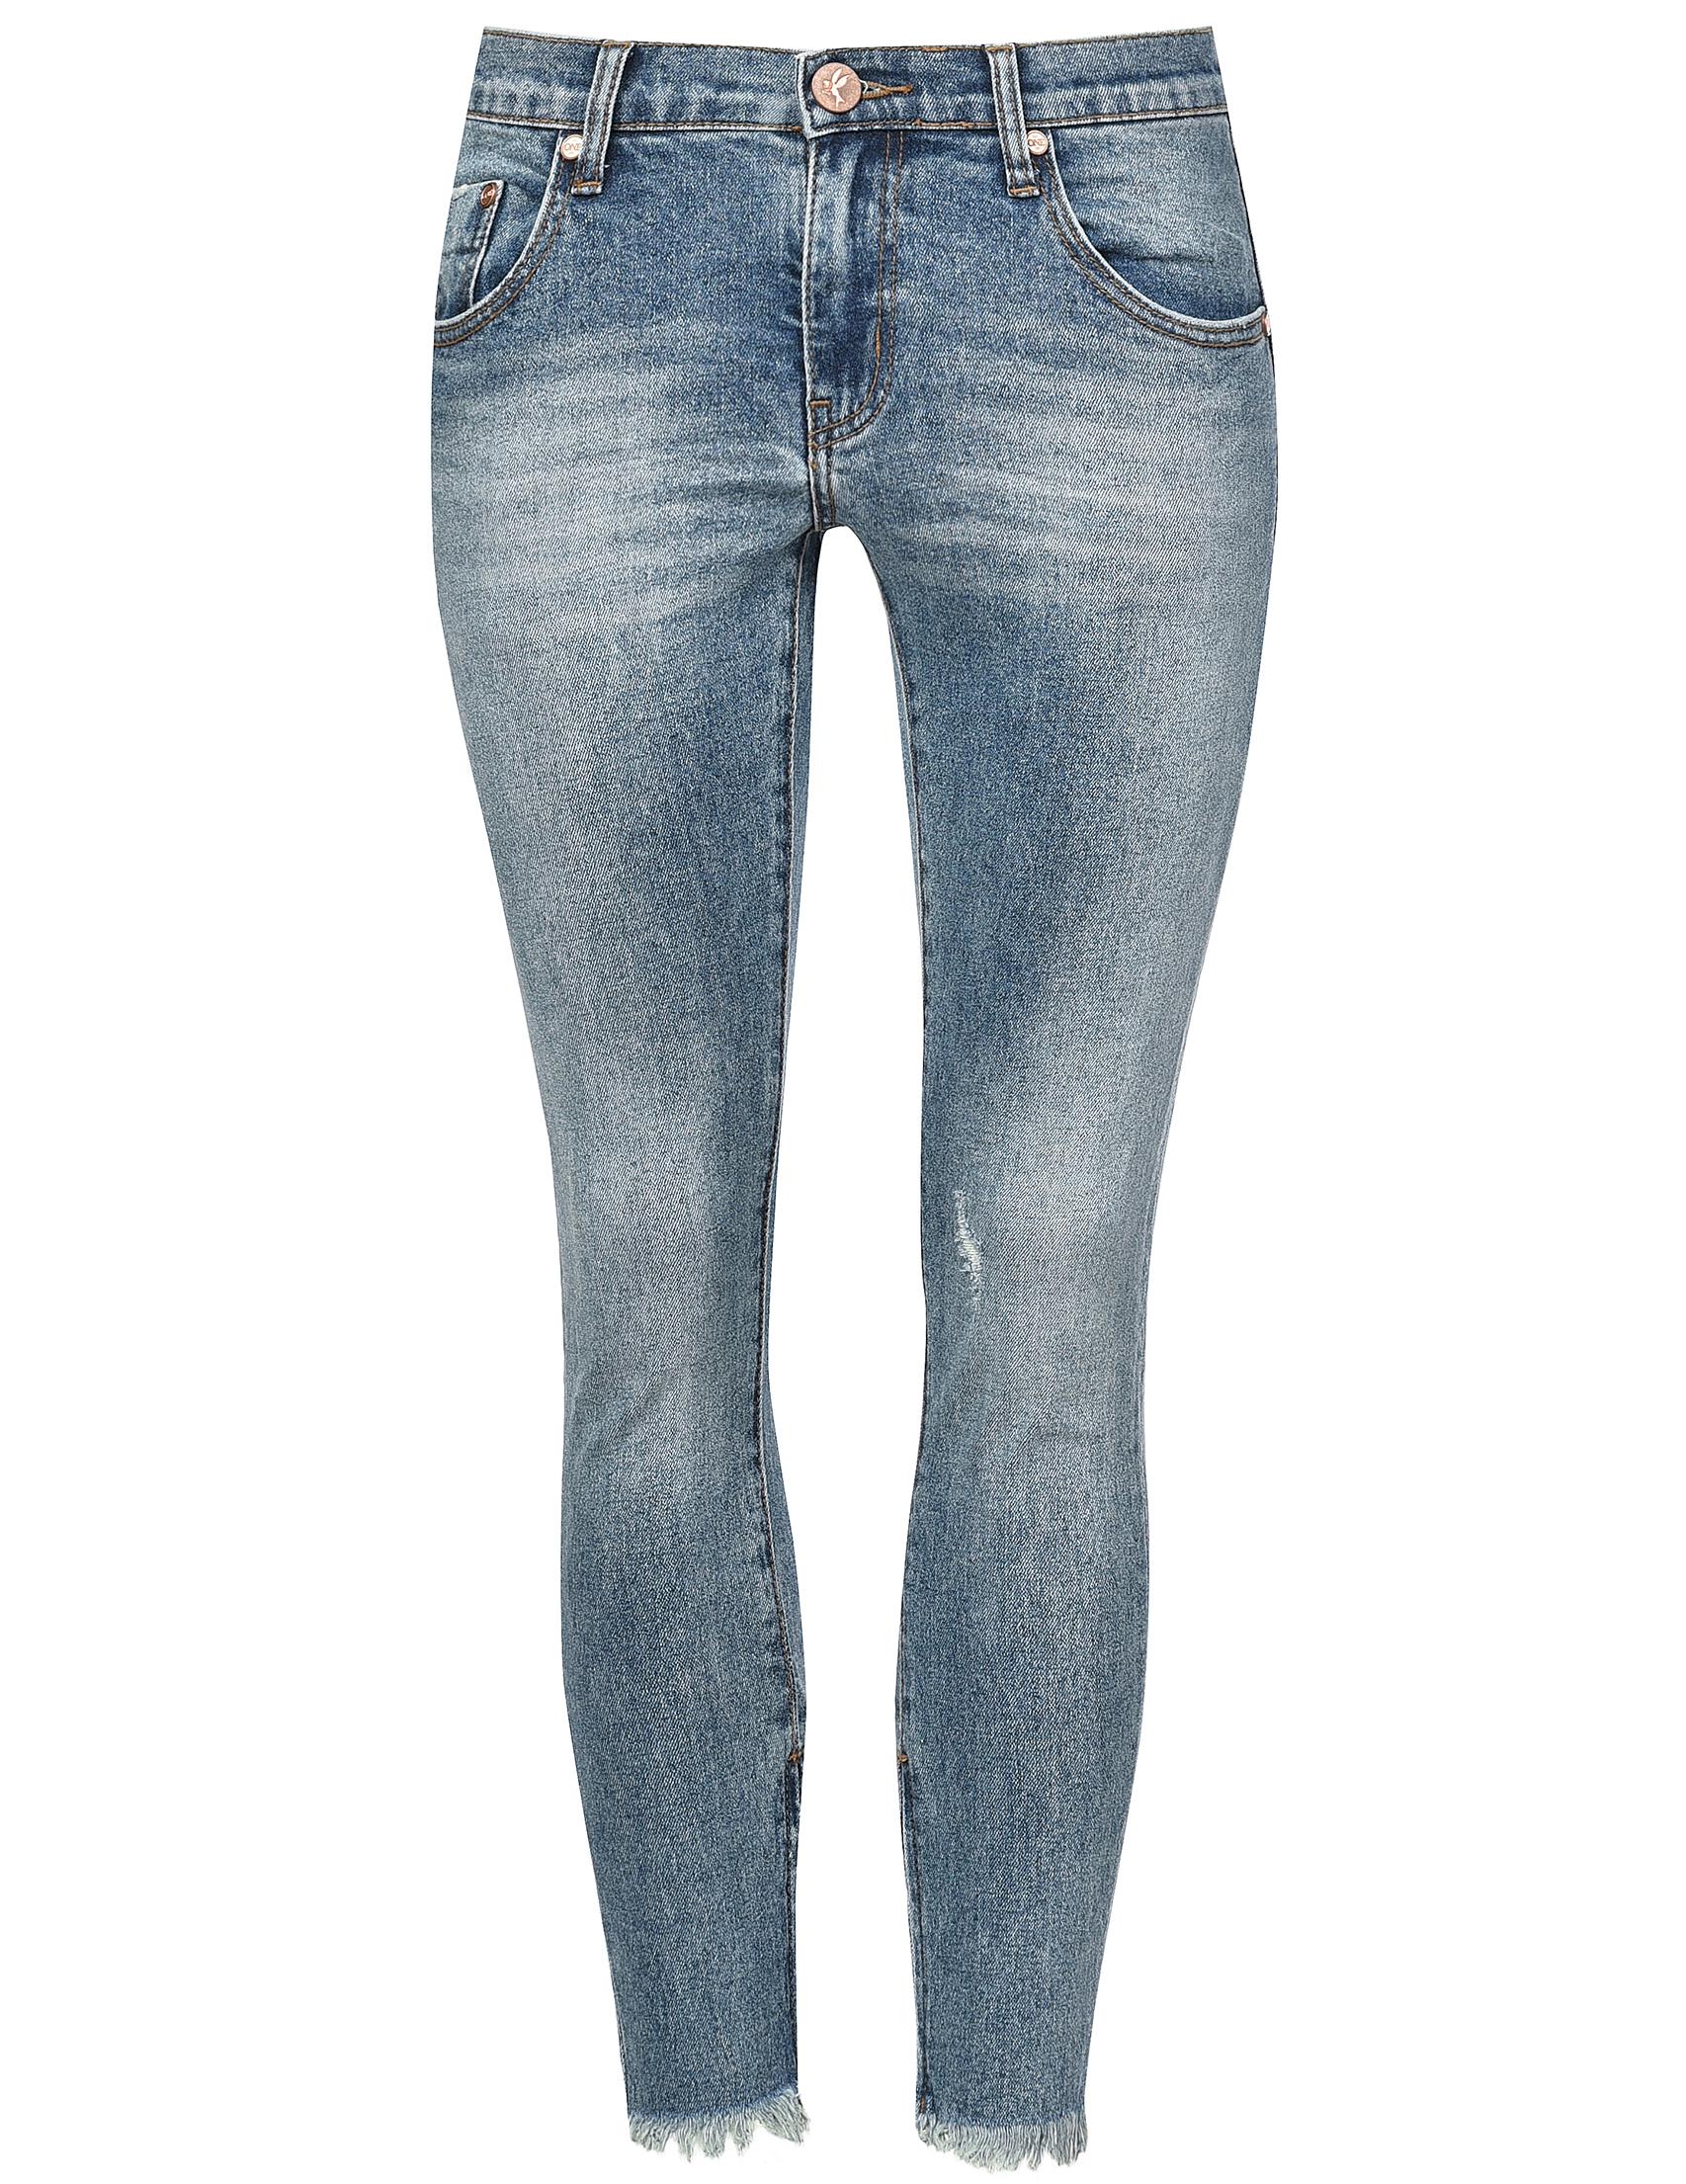 Женские джинсы ONETEASPOON 20690-newport_blue